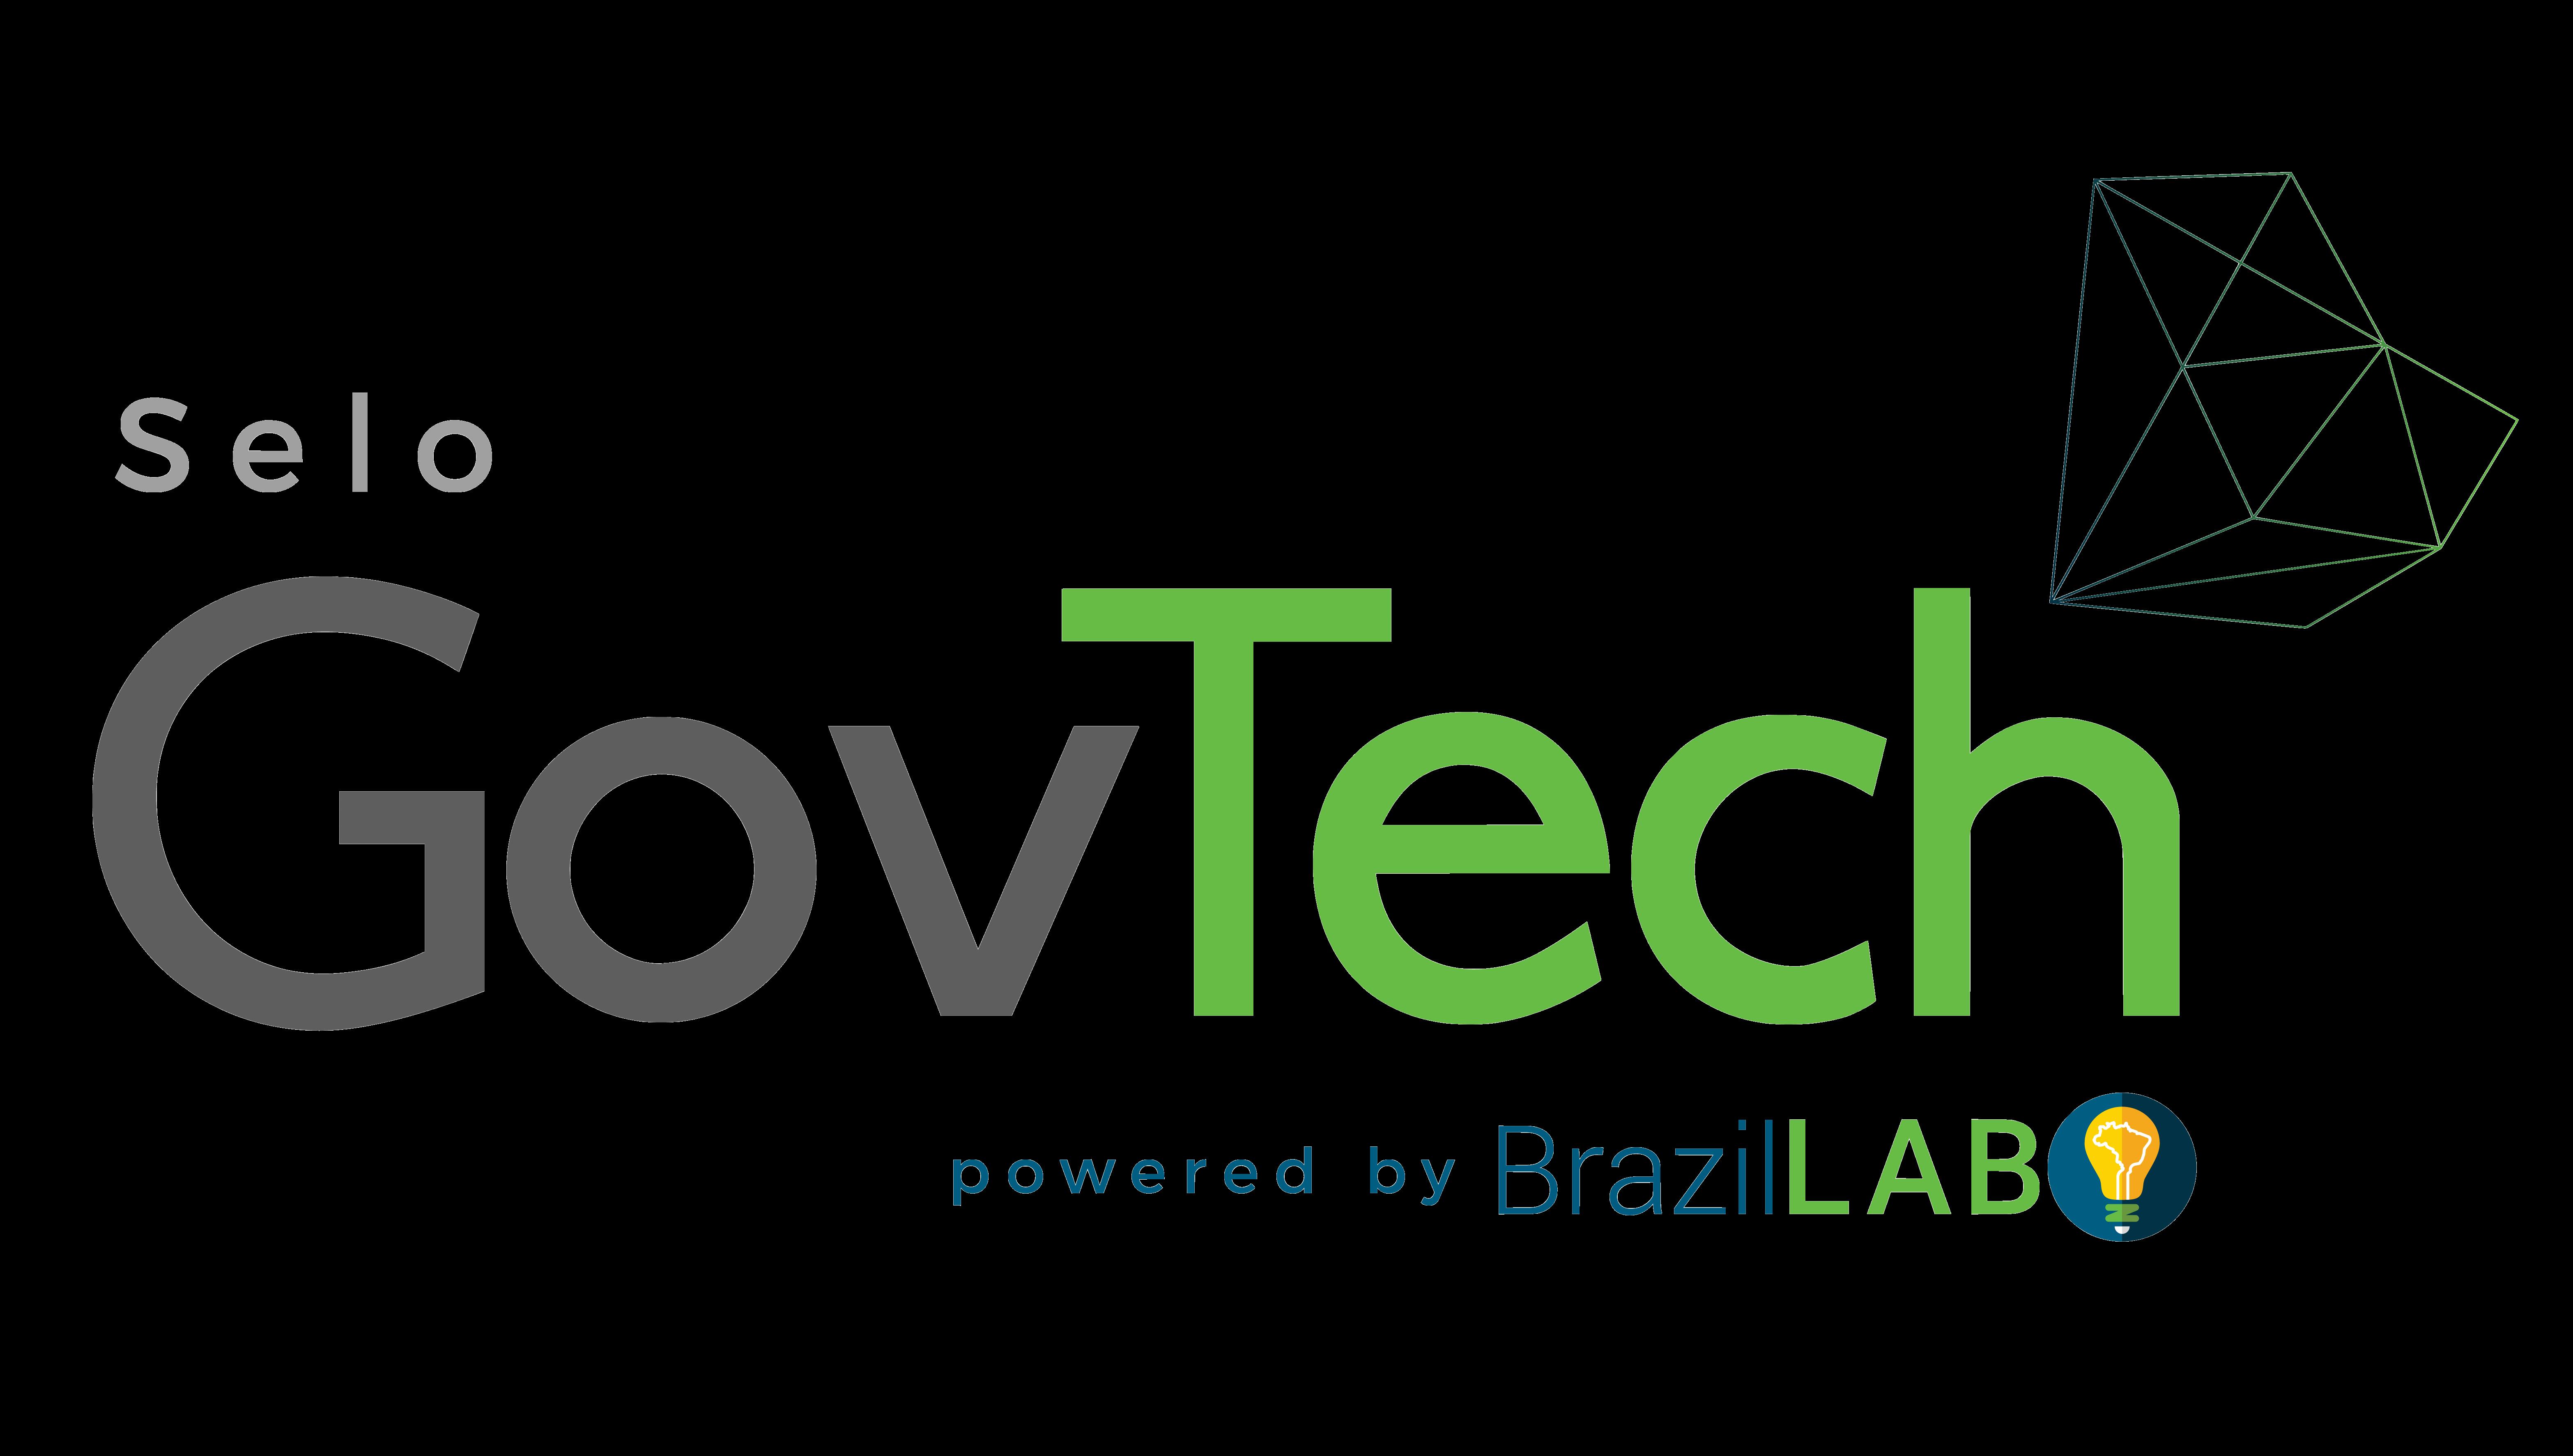 selo-brazillab